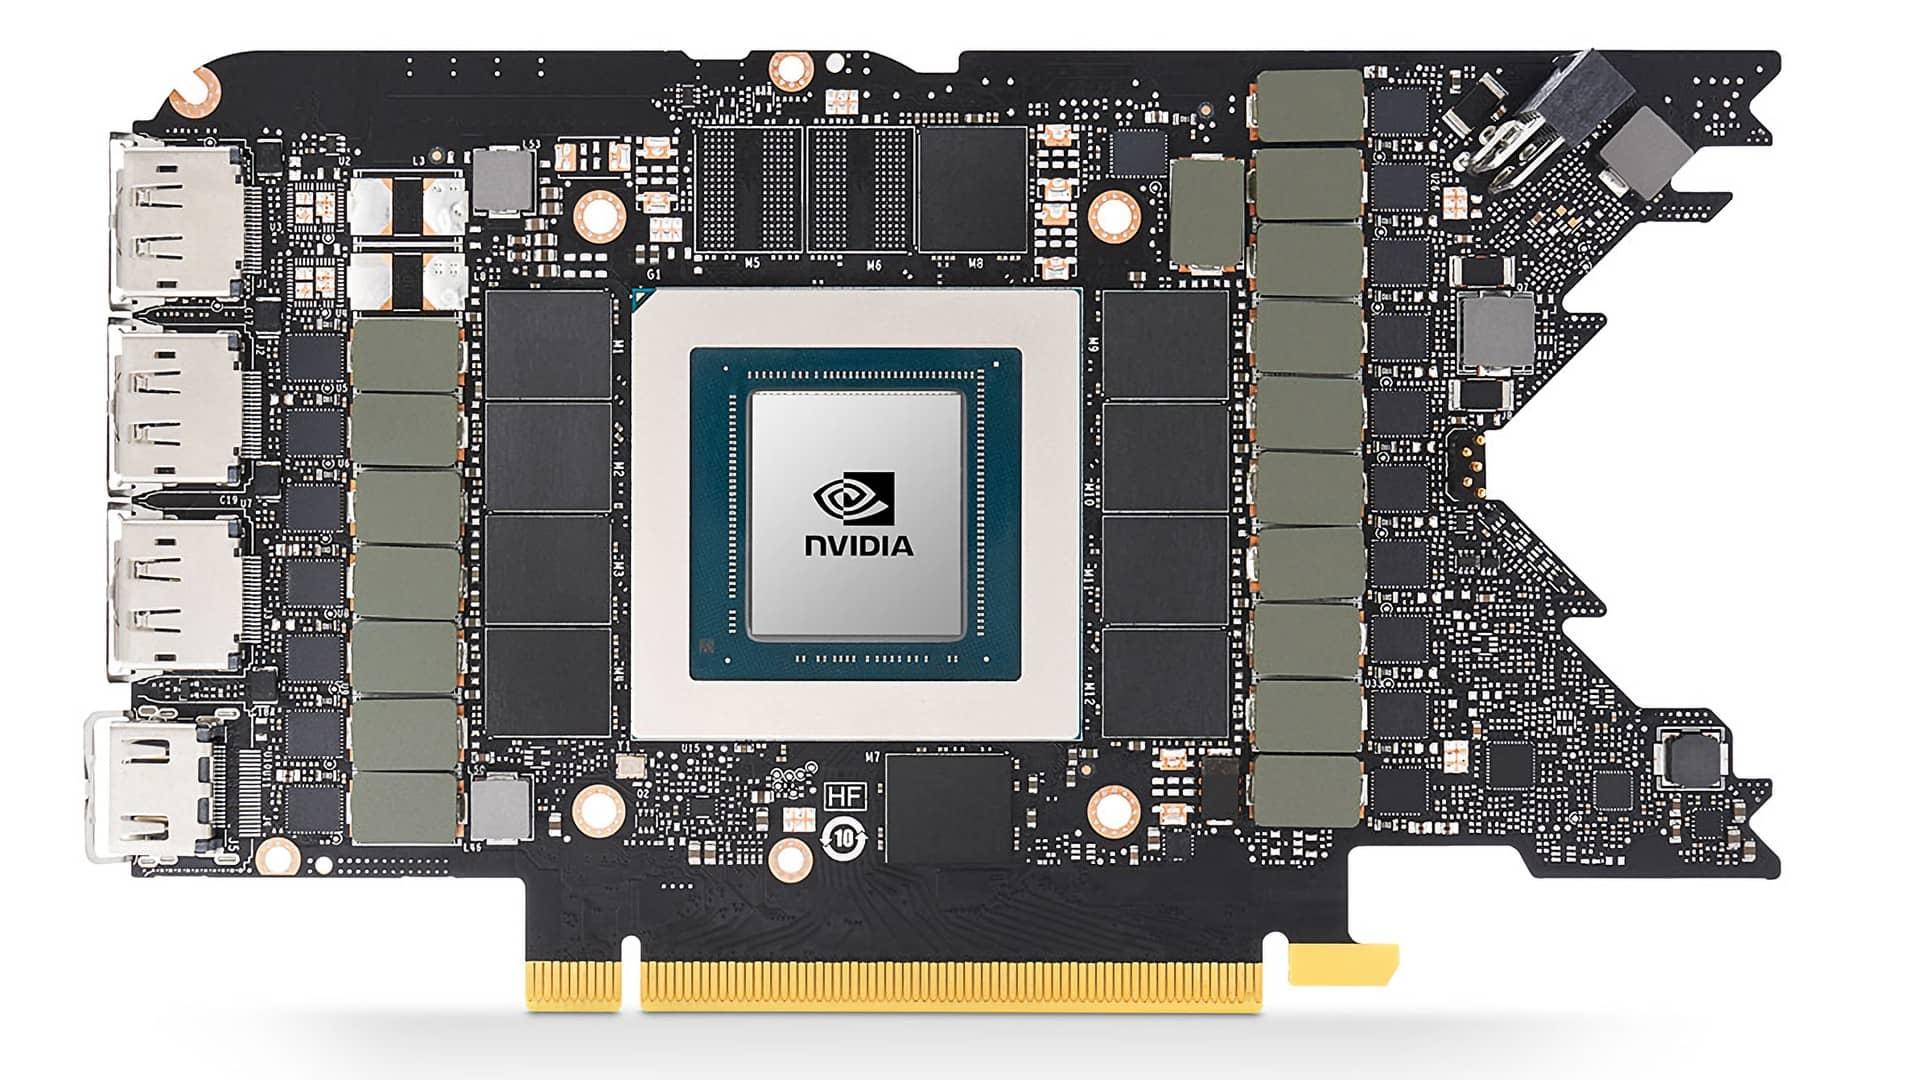 PCB GPU Ampere RTX 3080 FE